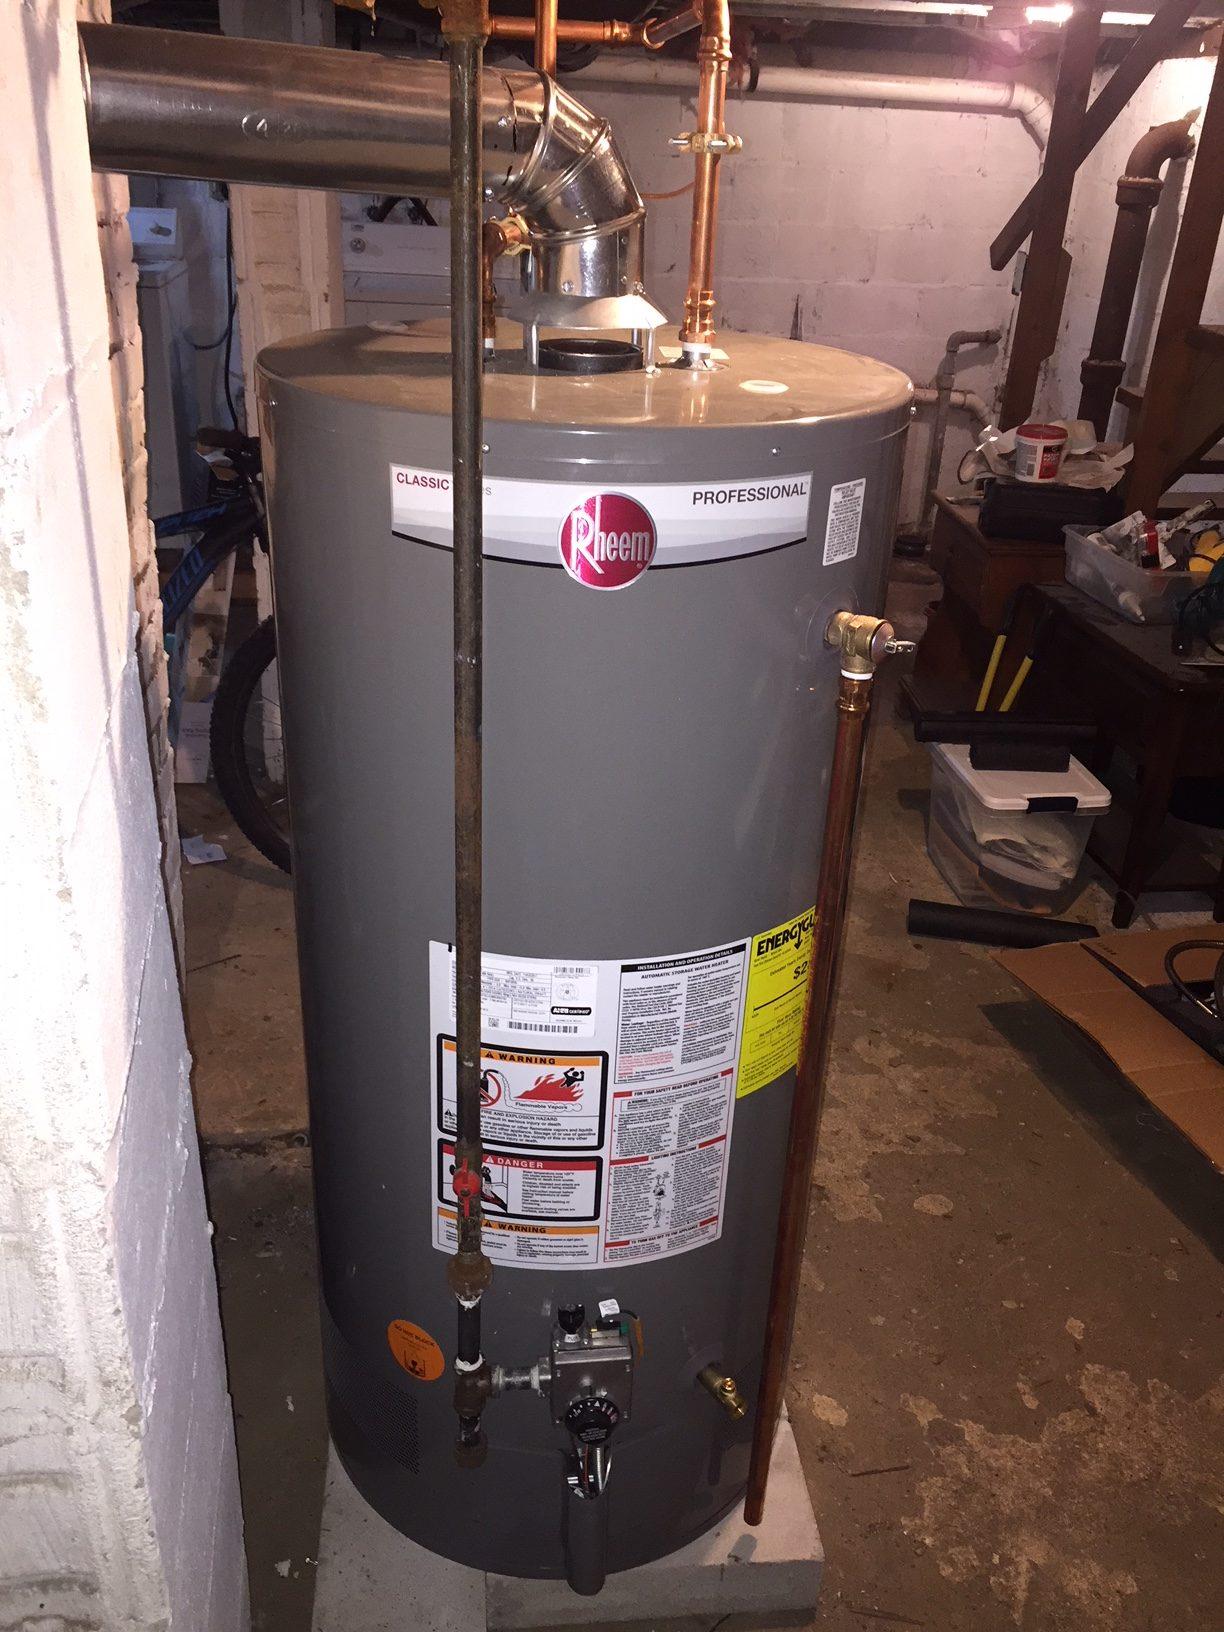 Nj Plumbing Company Water Heaters Sump Pumps Drain